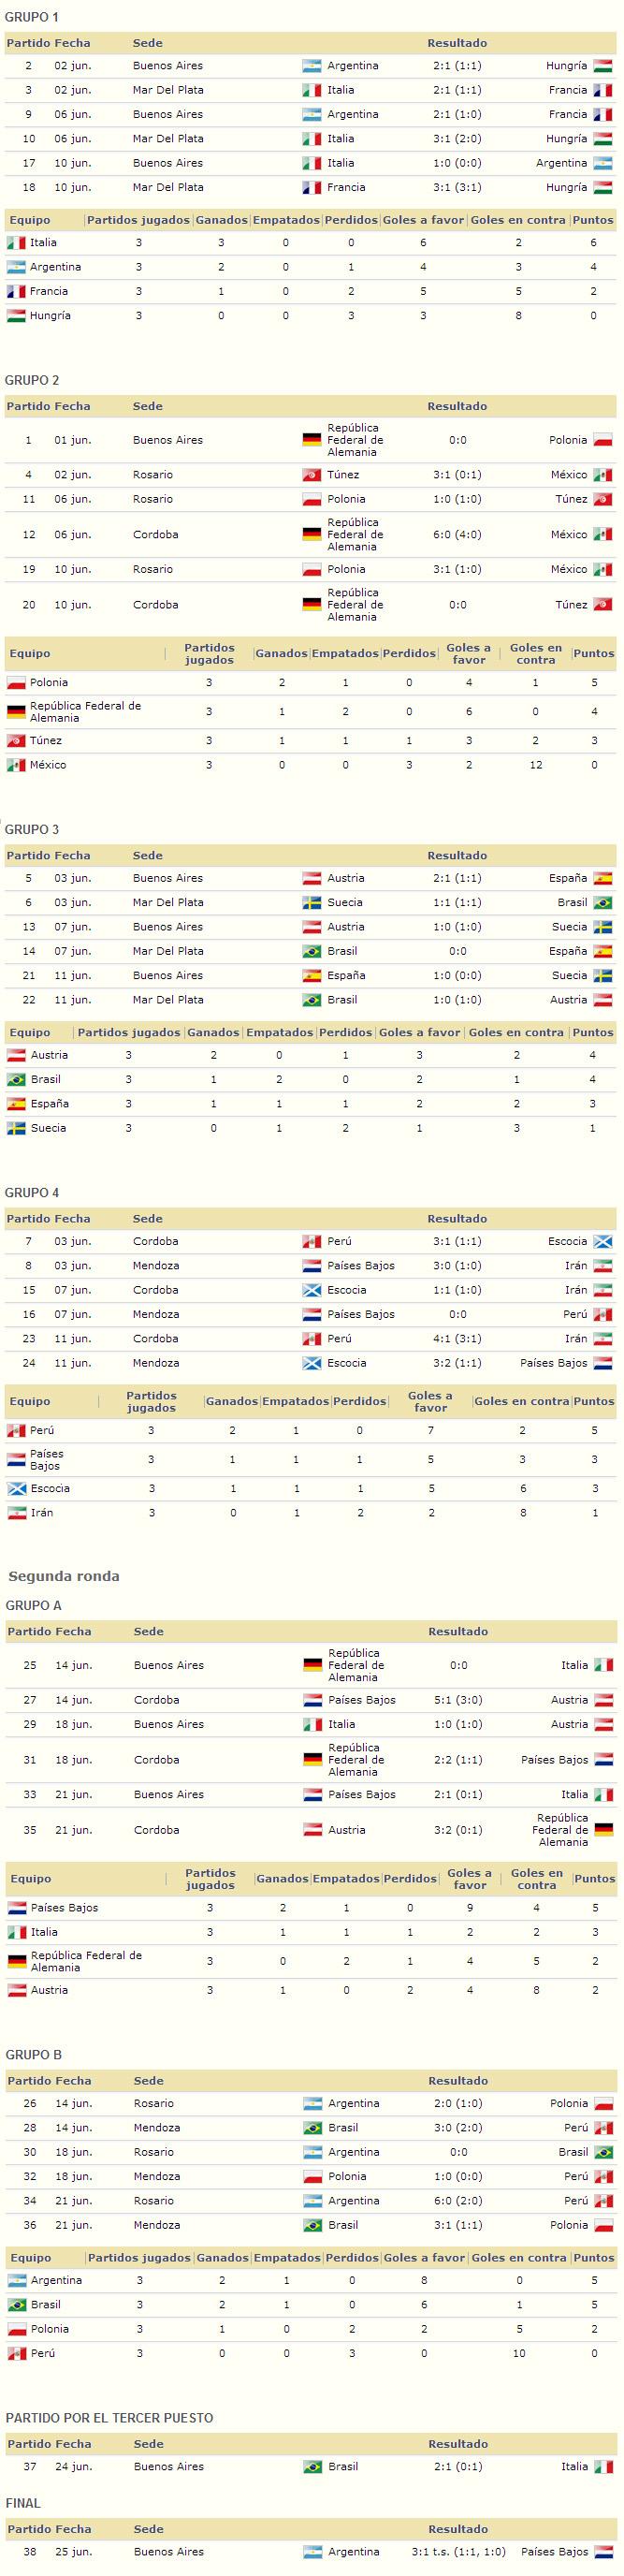 Mundial Argentina 1978 resultados